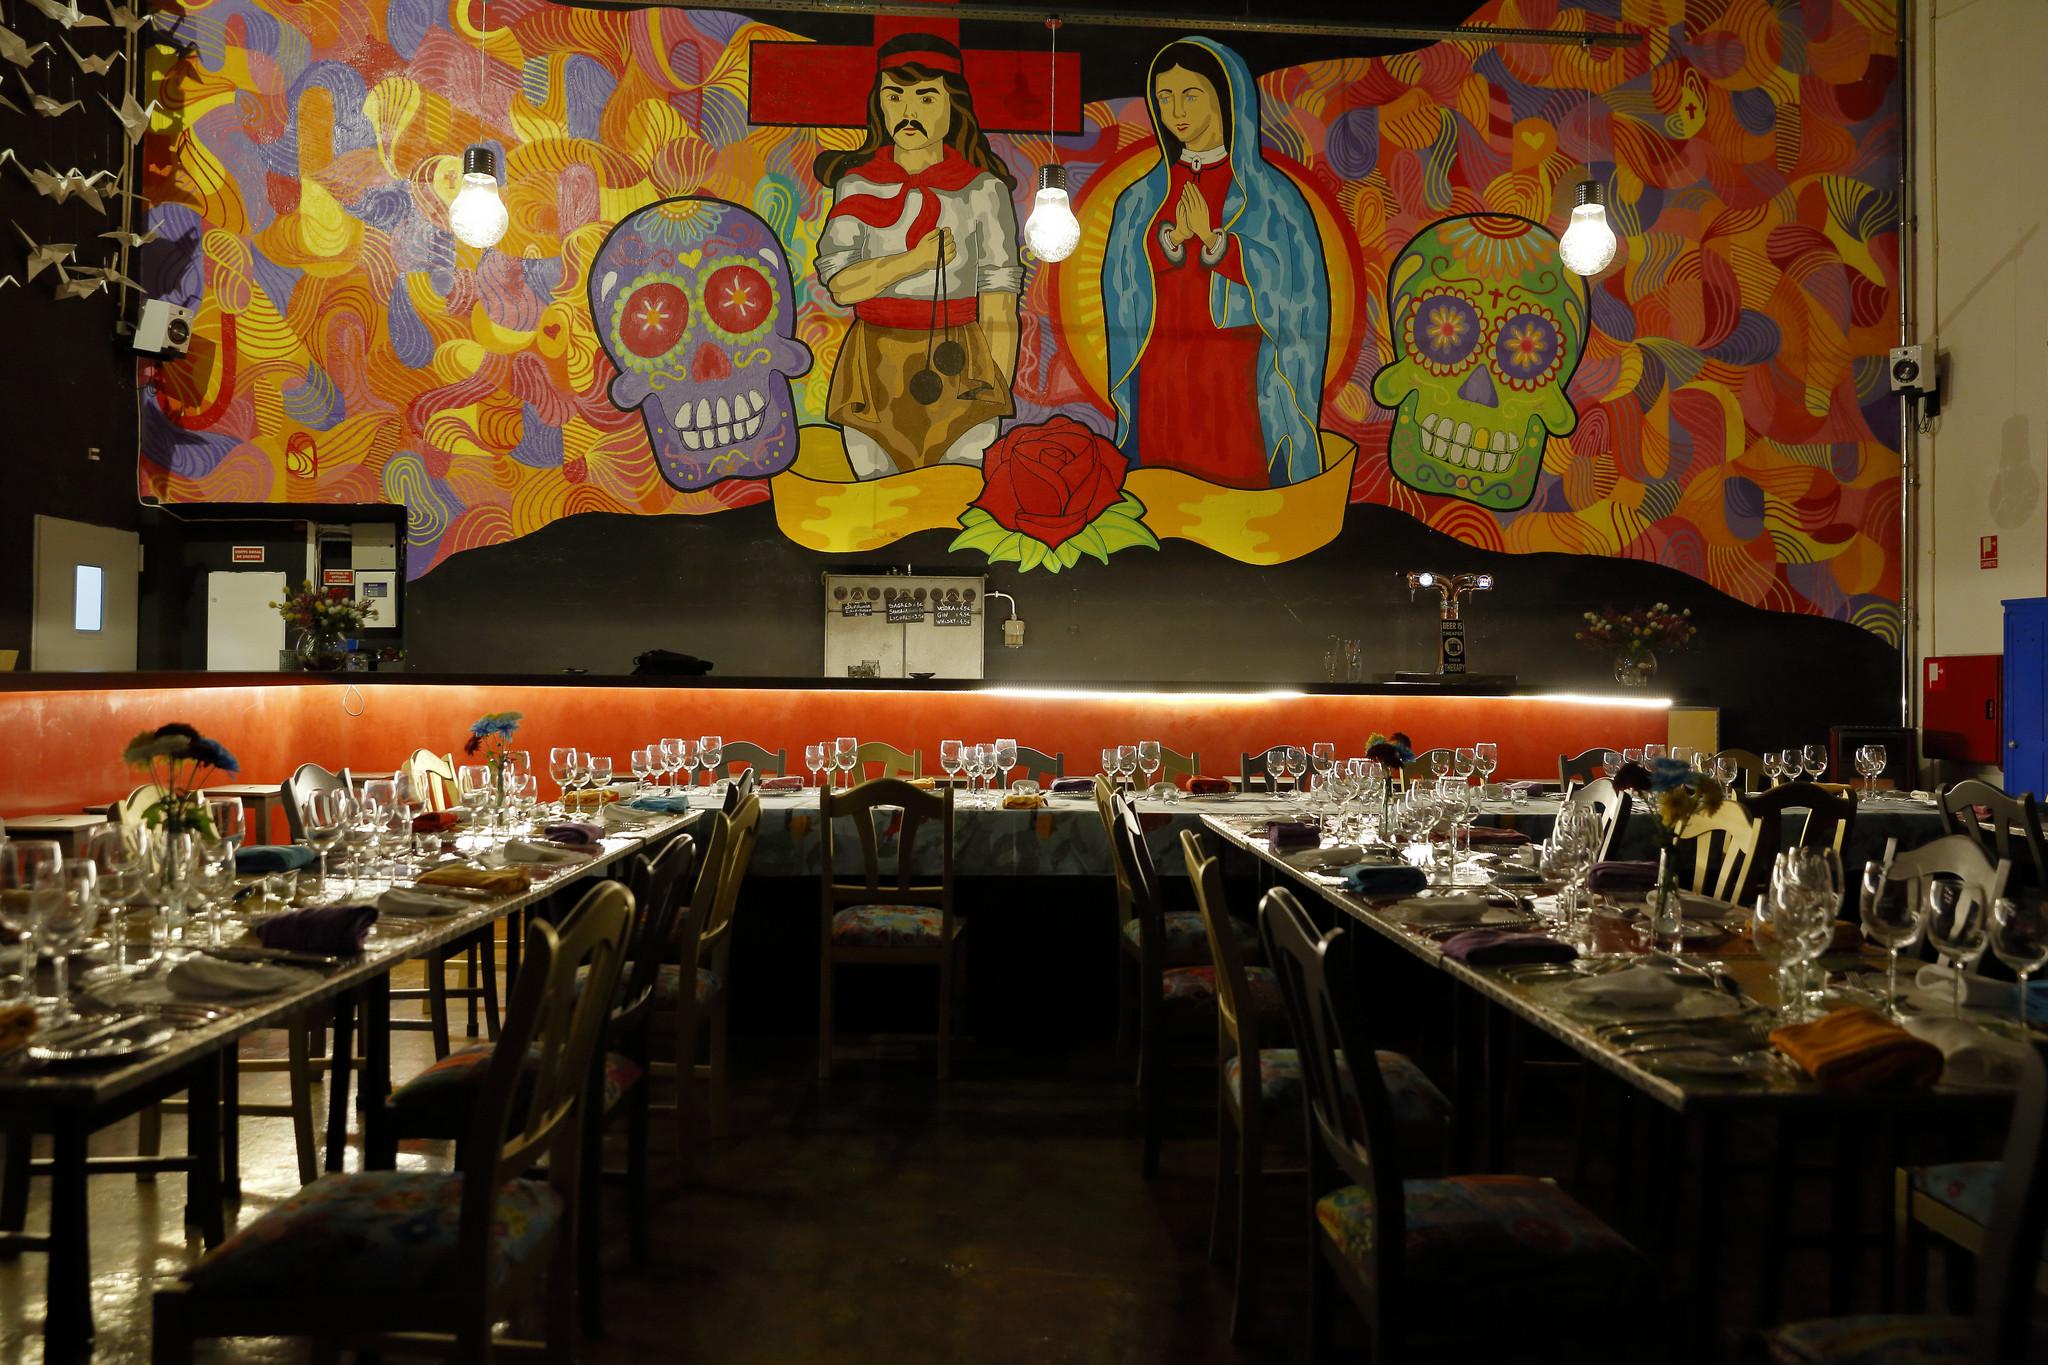 mj restaurante el bulo do chef chakall 12.jpg